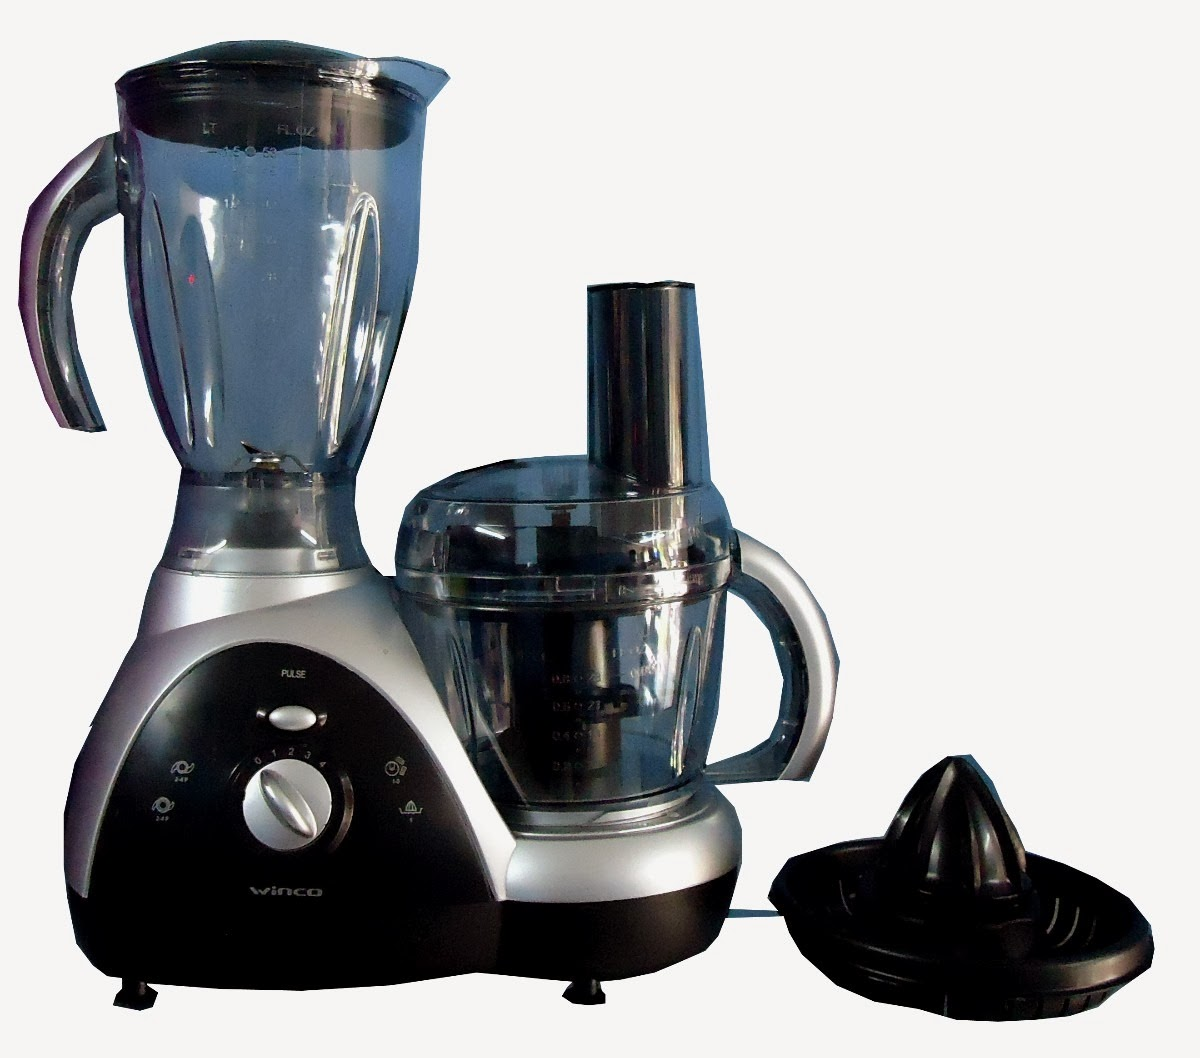 Batidora licuadora y robot de cocina - Robot de cocina batidora ...